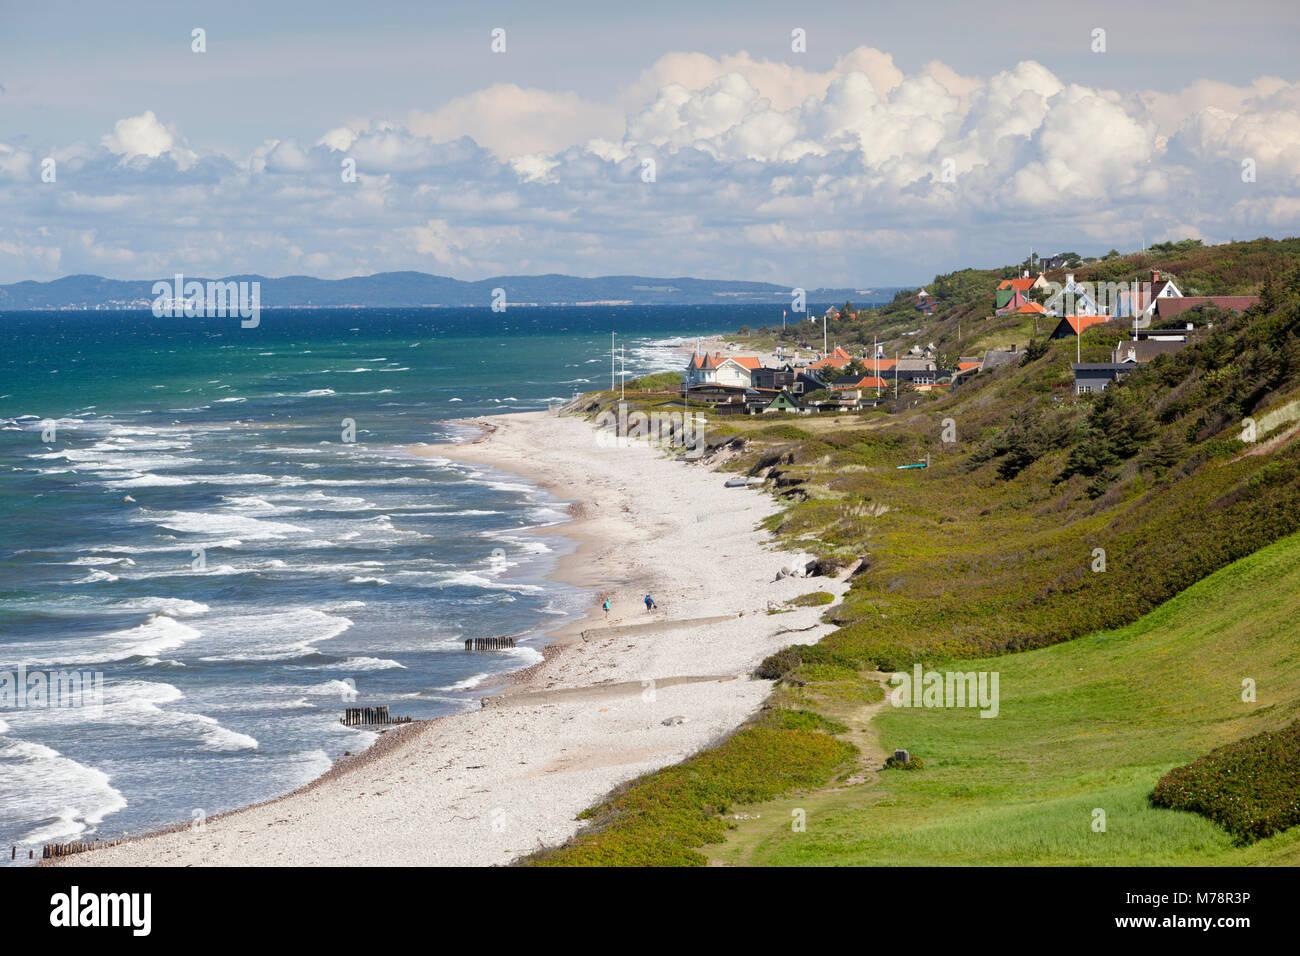 Vista su Rageleje Strand spiaggia con la costa svedese in distanza, Rageleje, Kattegat Costa, Zelanda, Danimarca, Immagini Stock